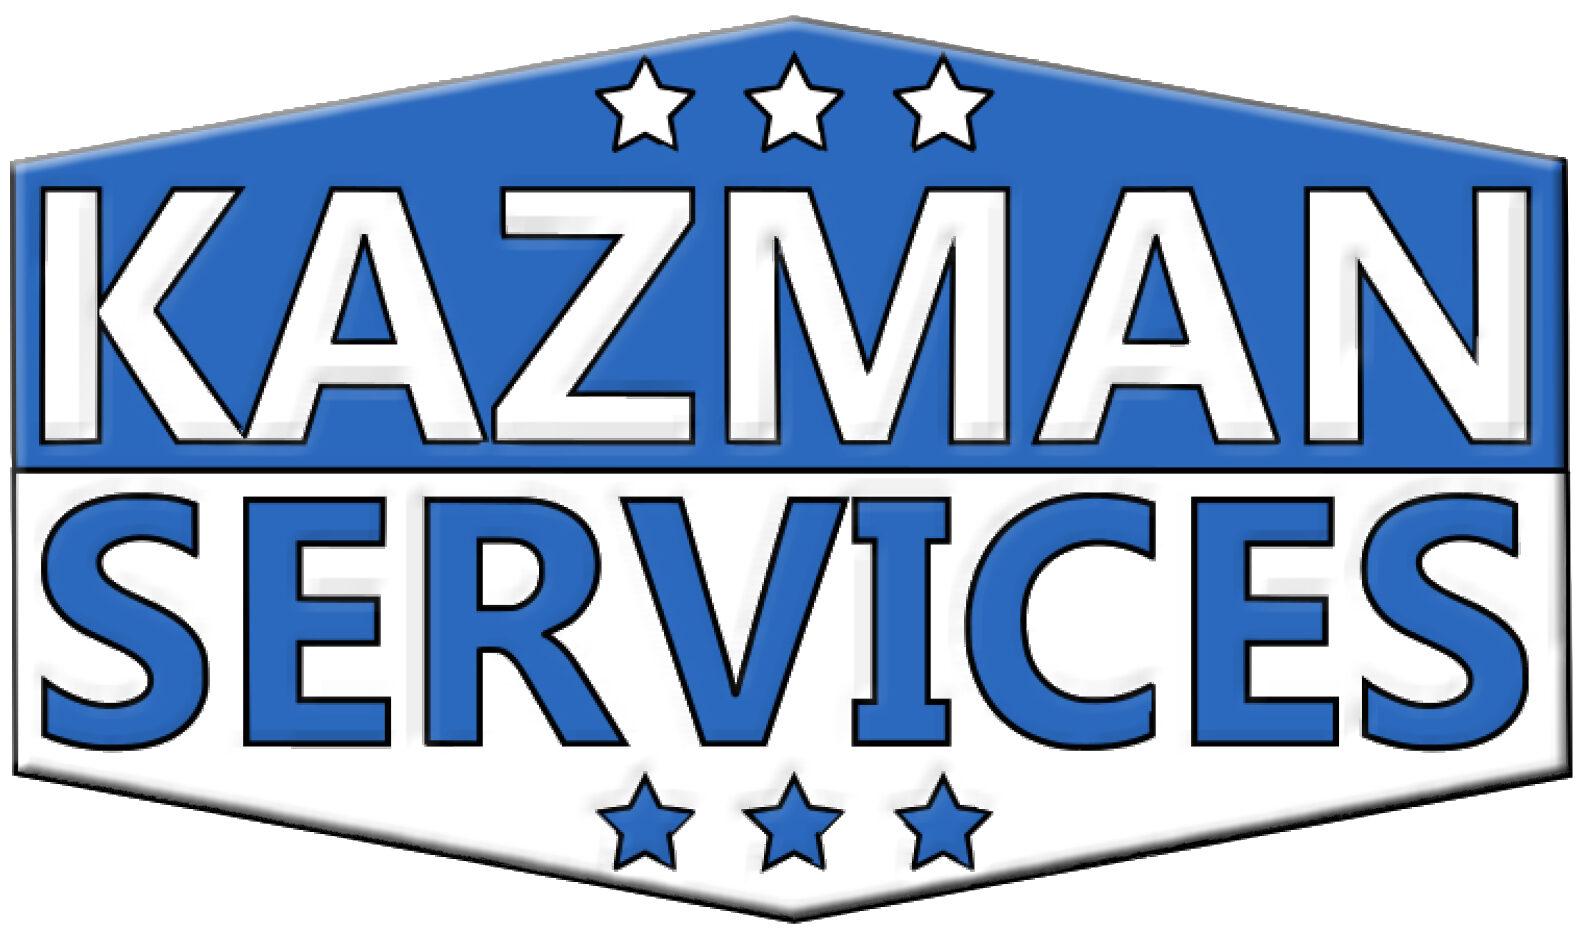 Kazman Services